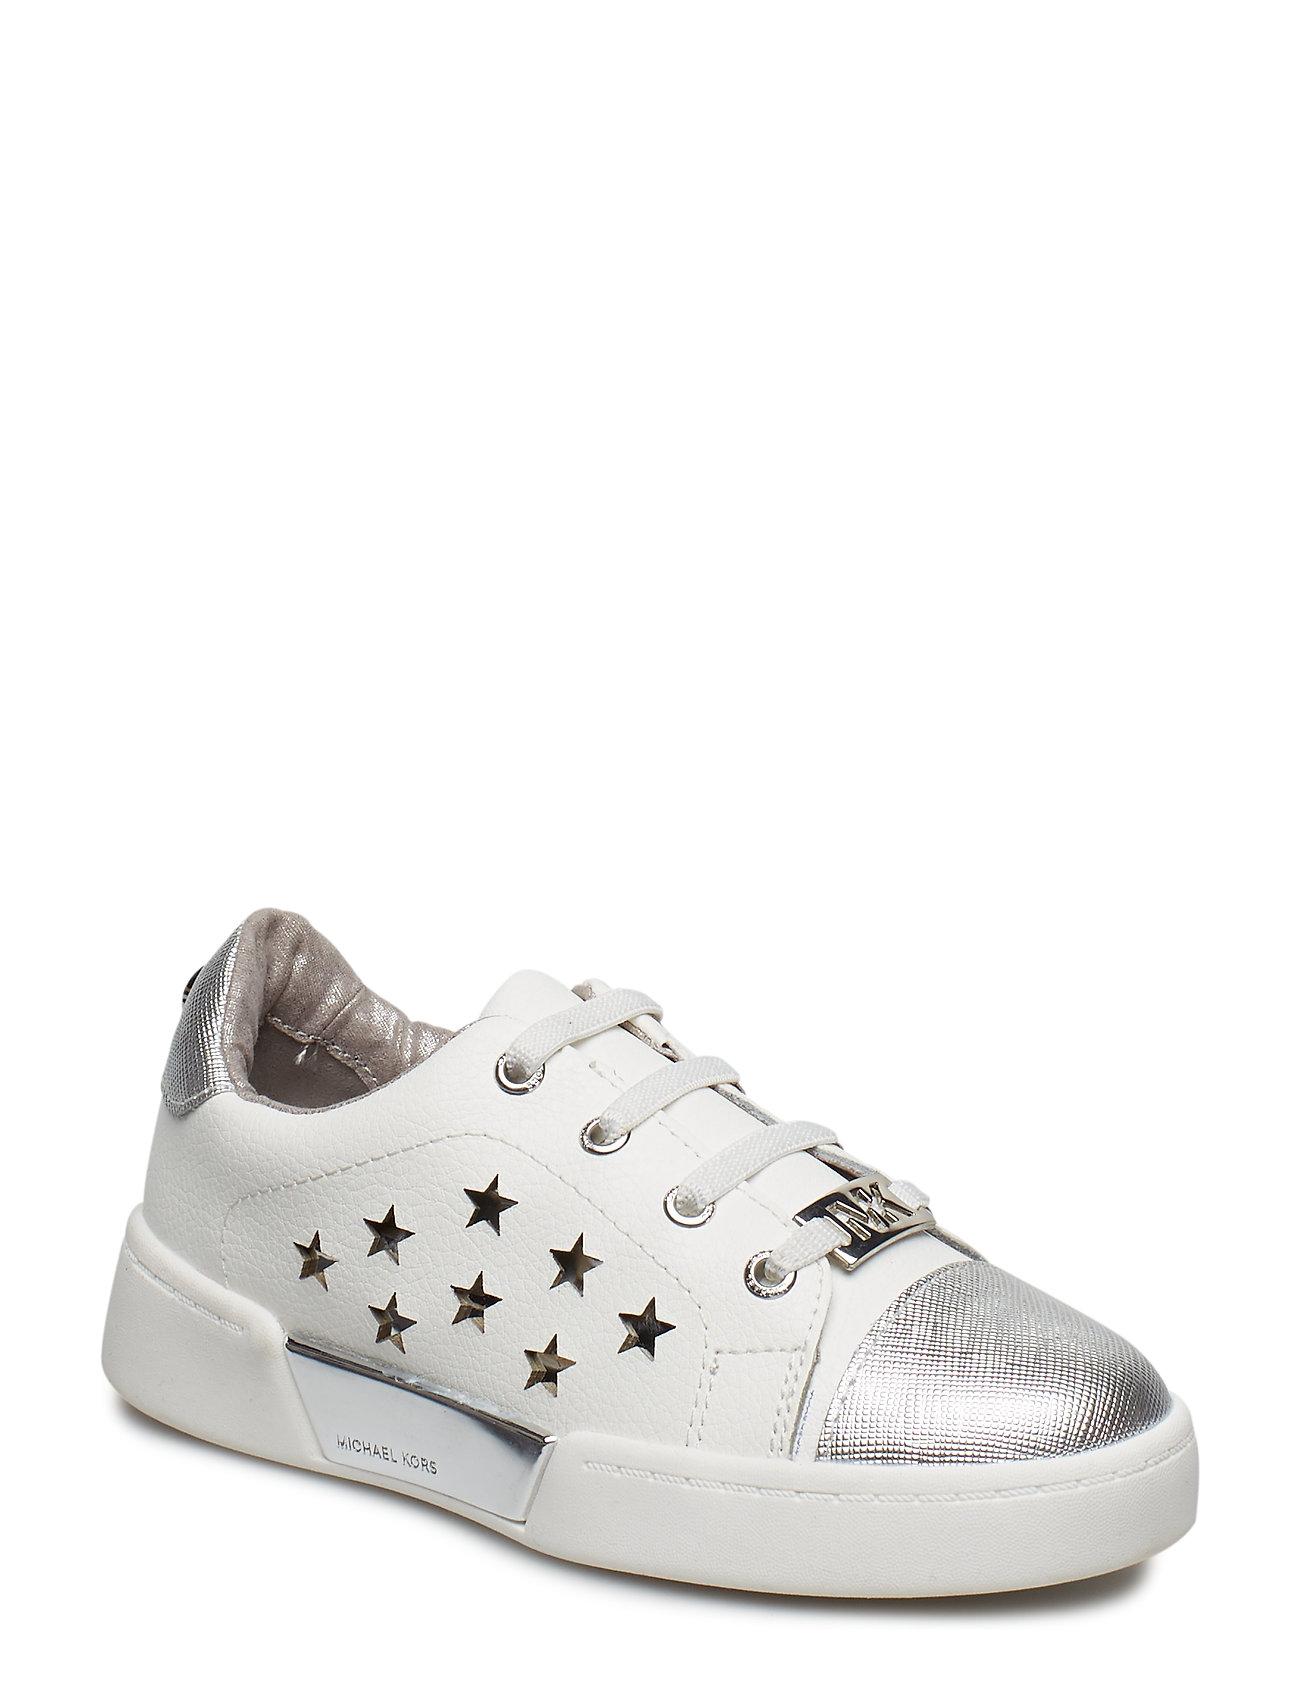 1b4aef6a Hvid Michael Kors Zia Guard Bae-T sneakers for børn - Pashion.dk